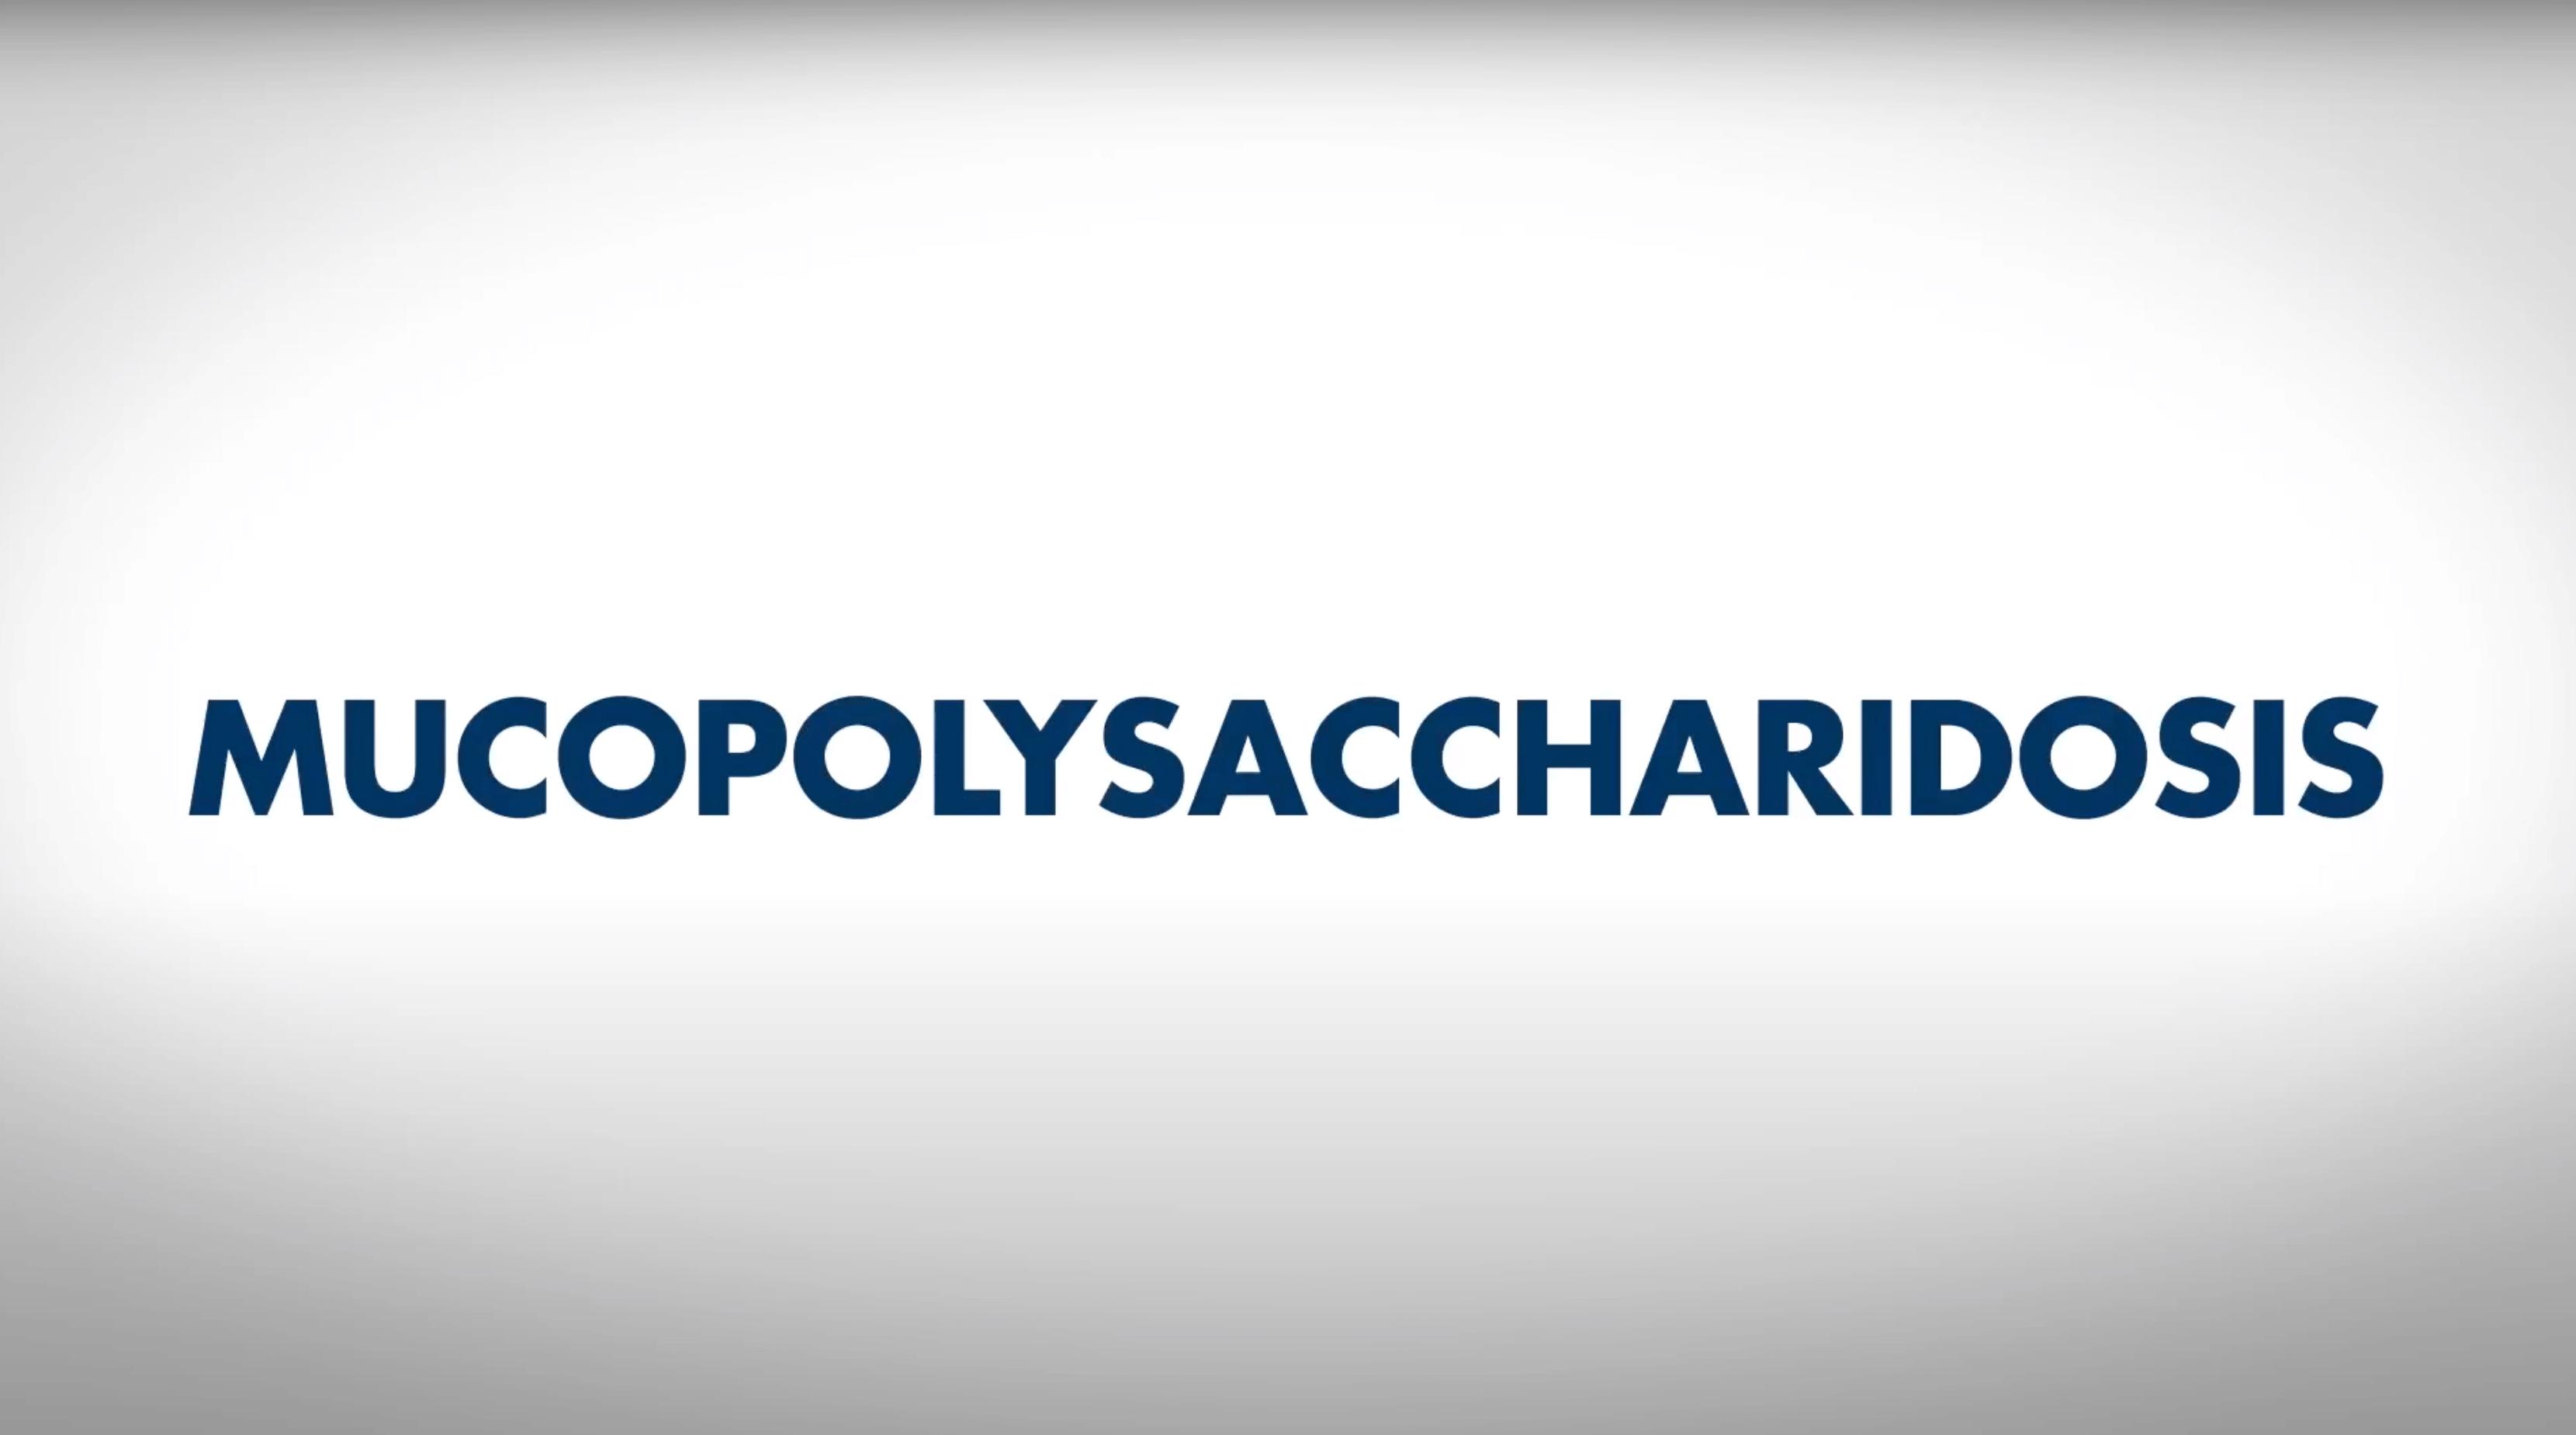 Image: Mucopolysaccharidosis screenshot